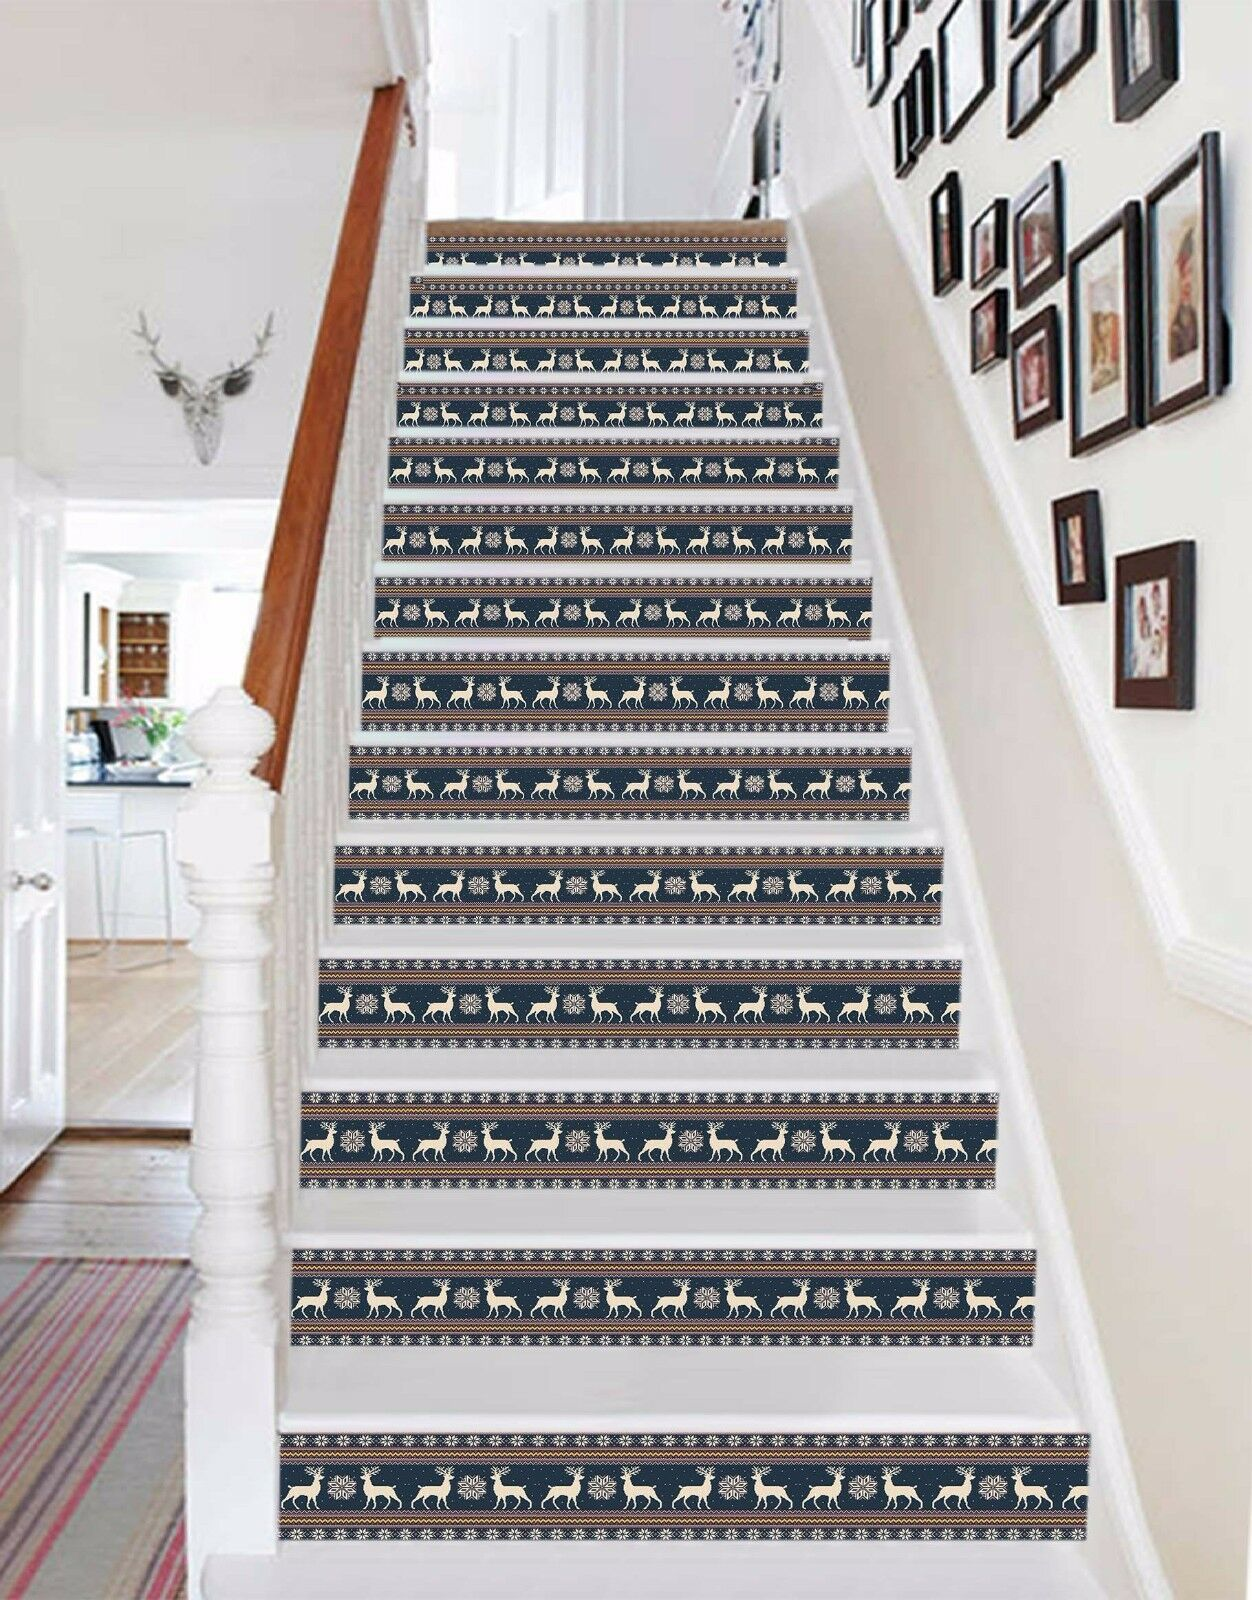 3D Hirsch 48 Stair Risers Dekoration Fototapete Vinyl Aufkleber Tapete DE Lemon